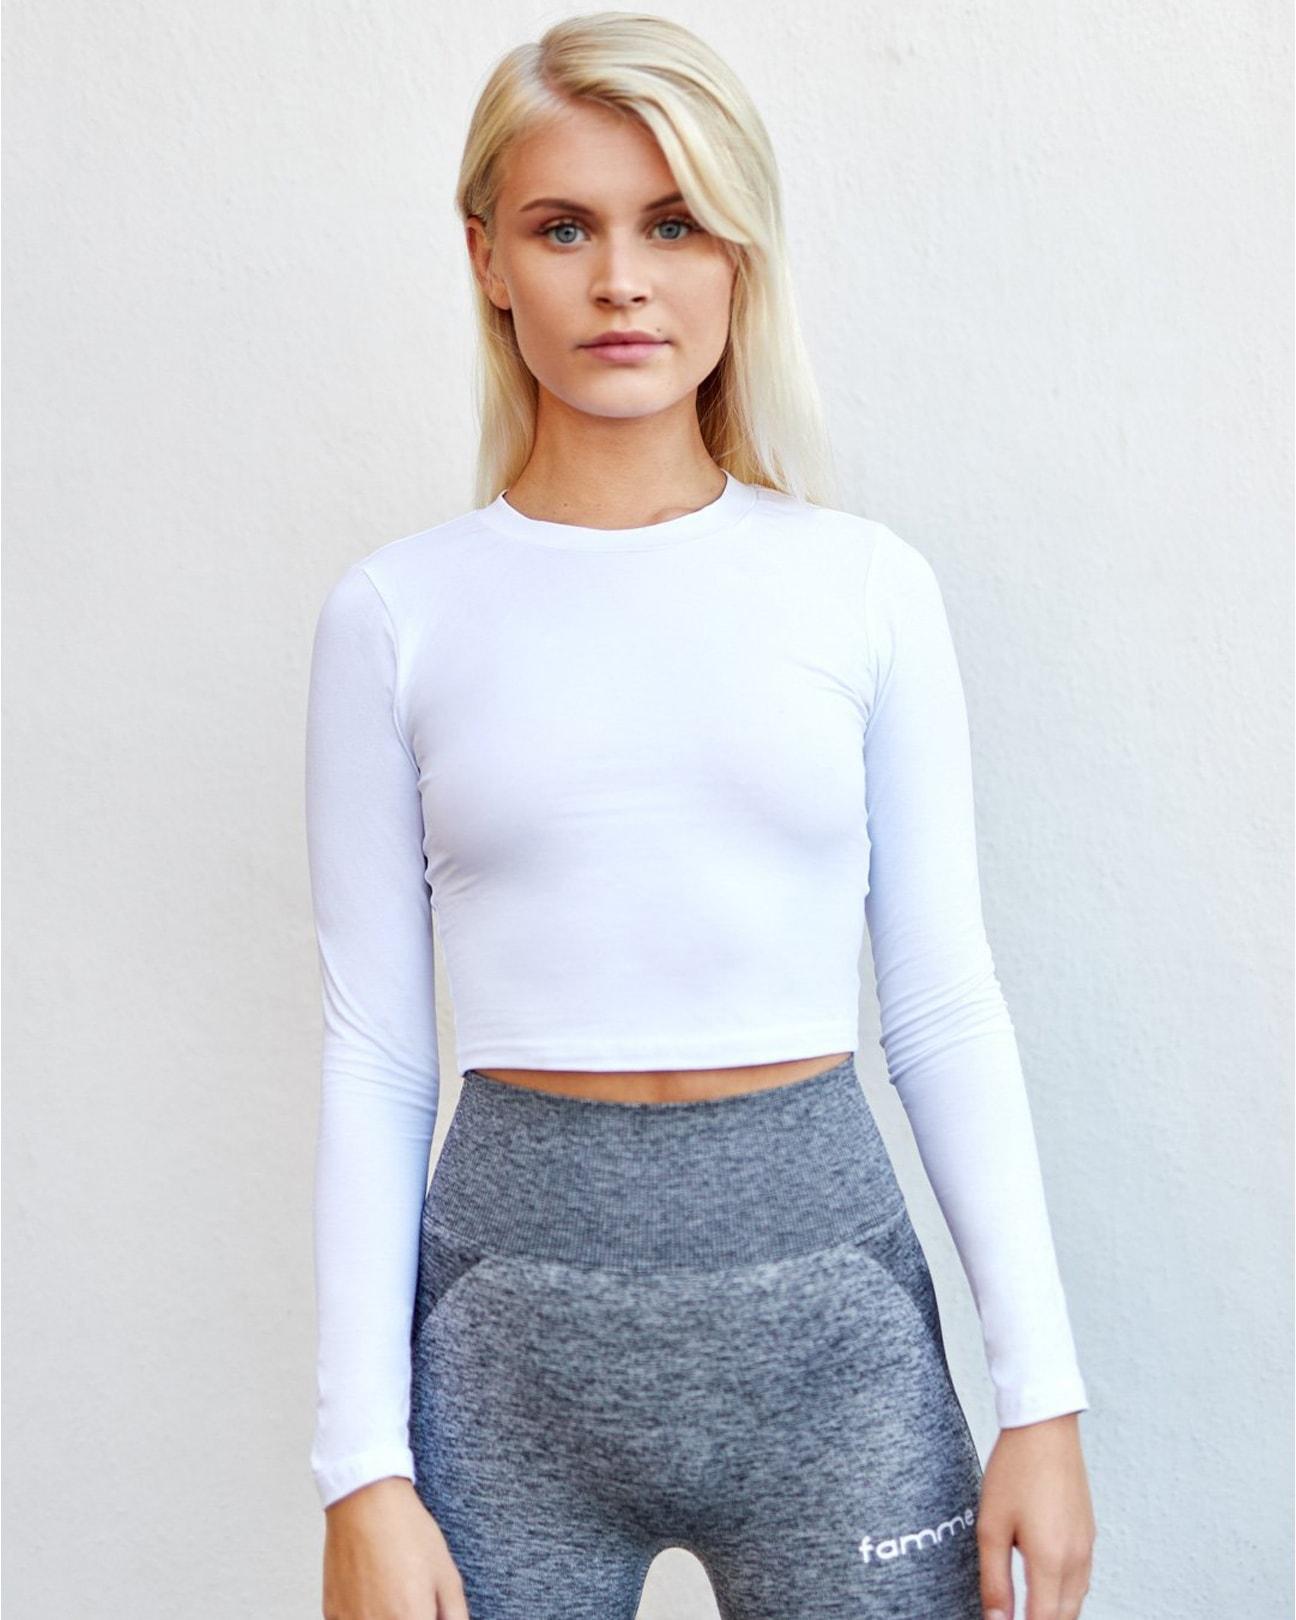 women-seamless-Sport-top-Fitness-Running-gym-clothes-white-jersey-crop-long-sleeve_2000x